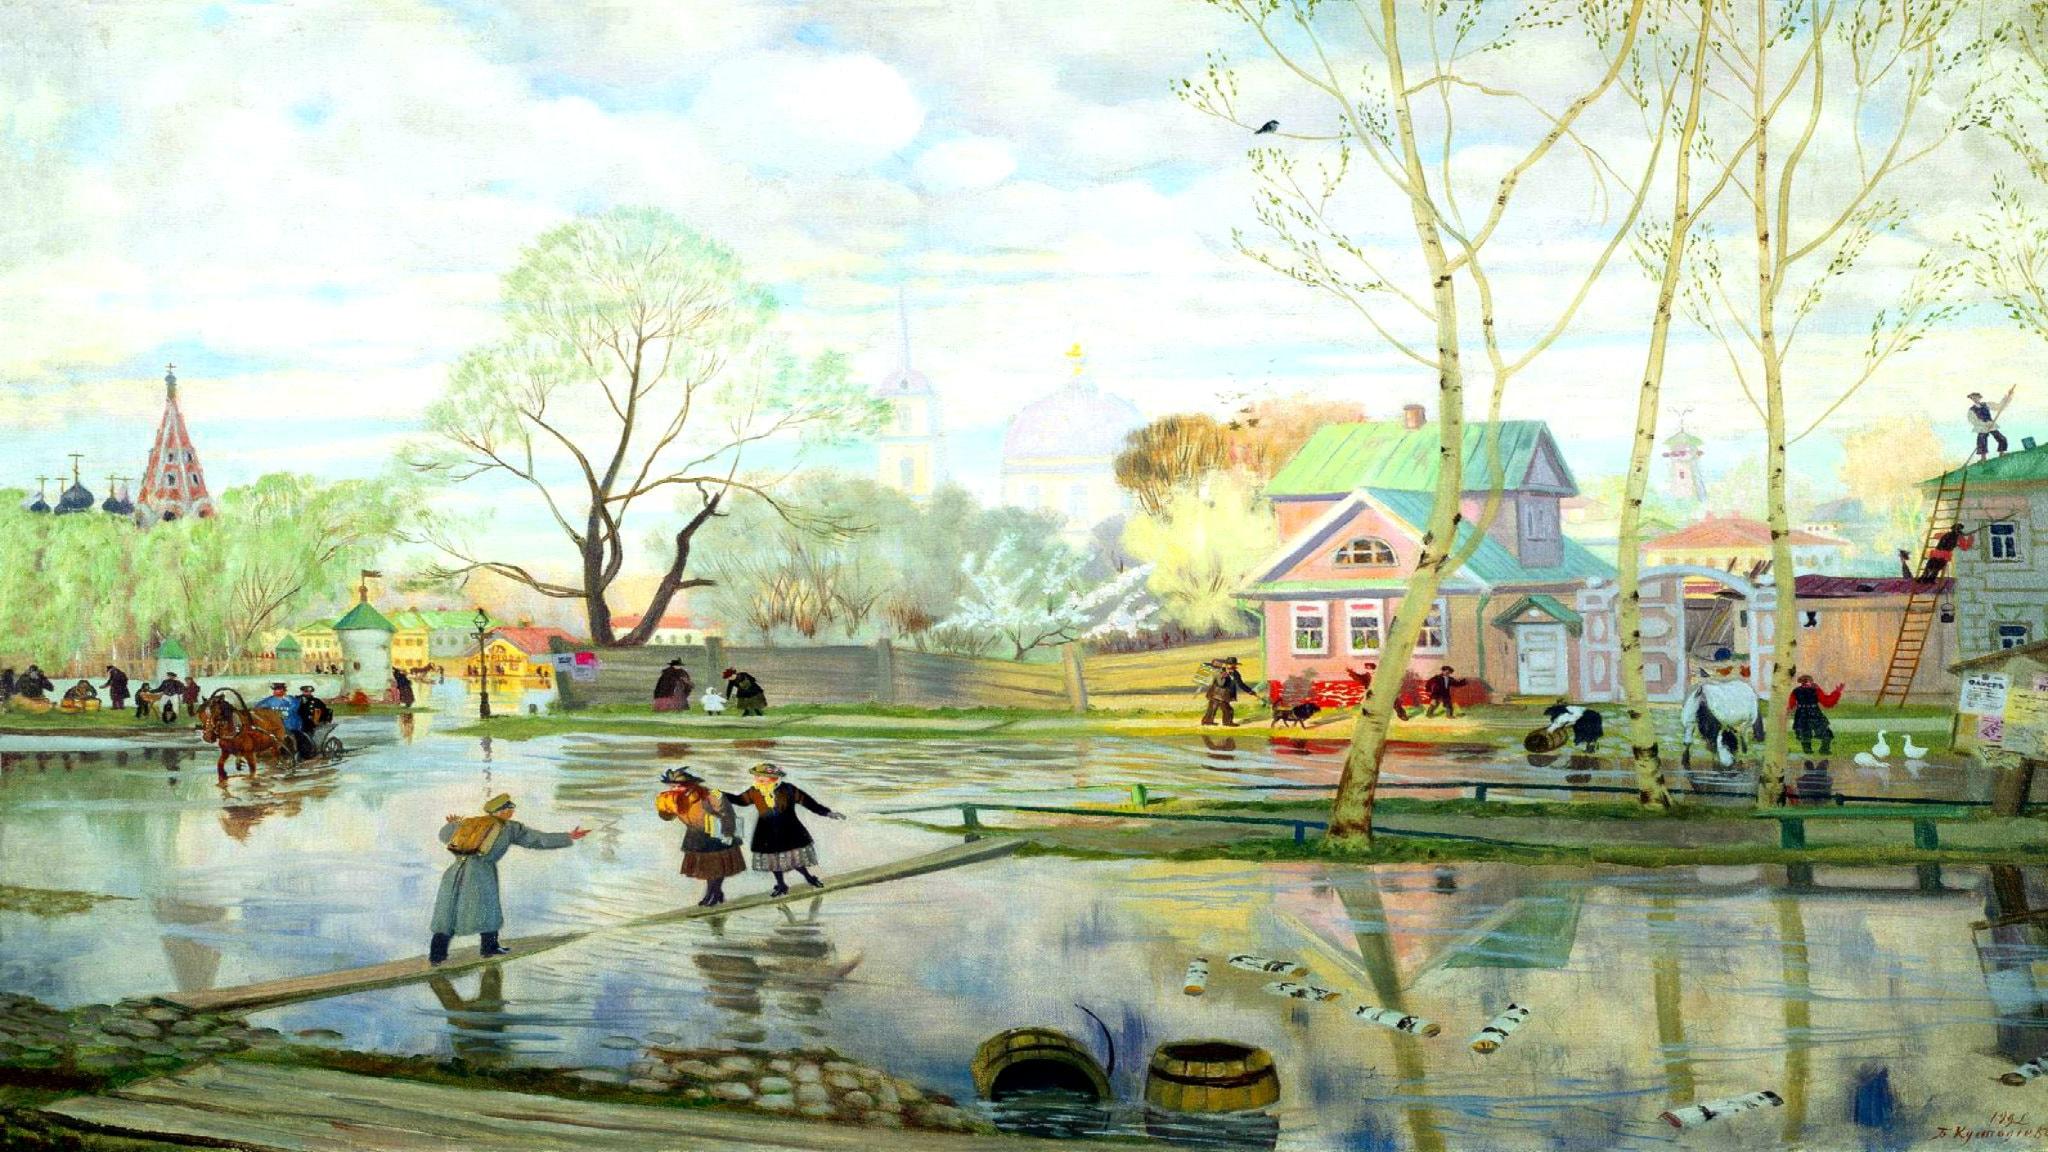 'Vår'. Boris Kustodiev, 1921